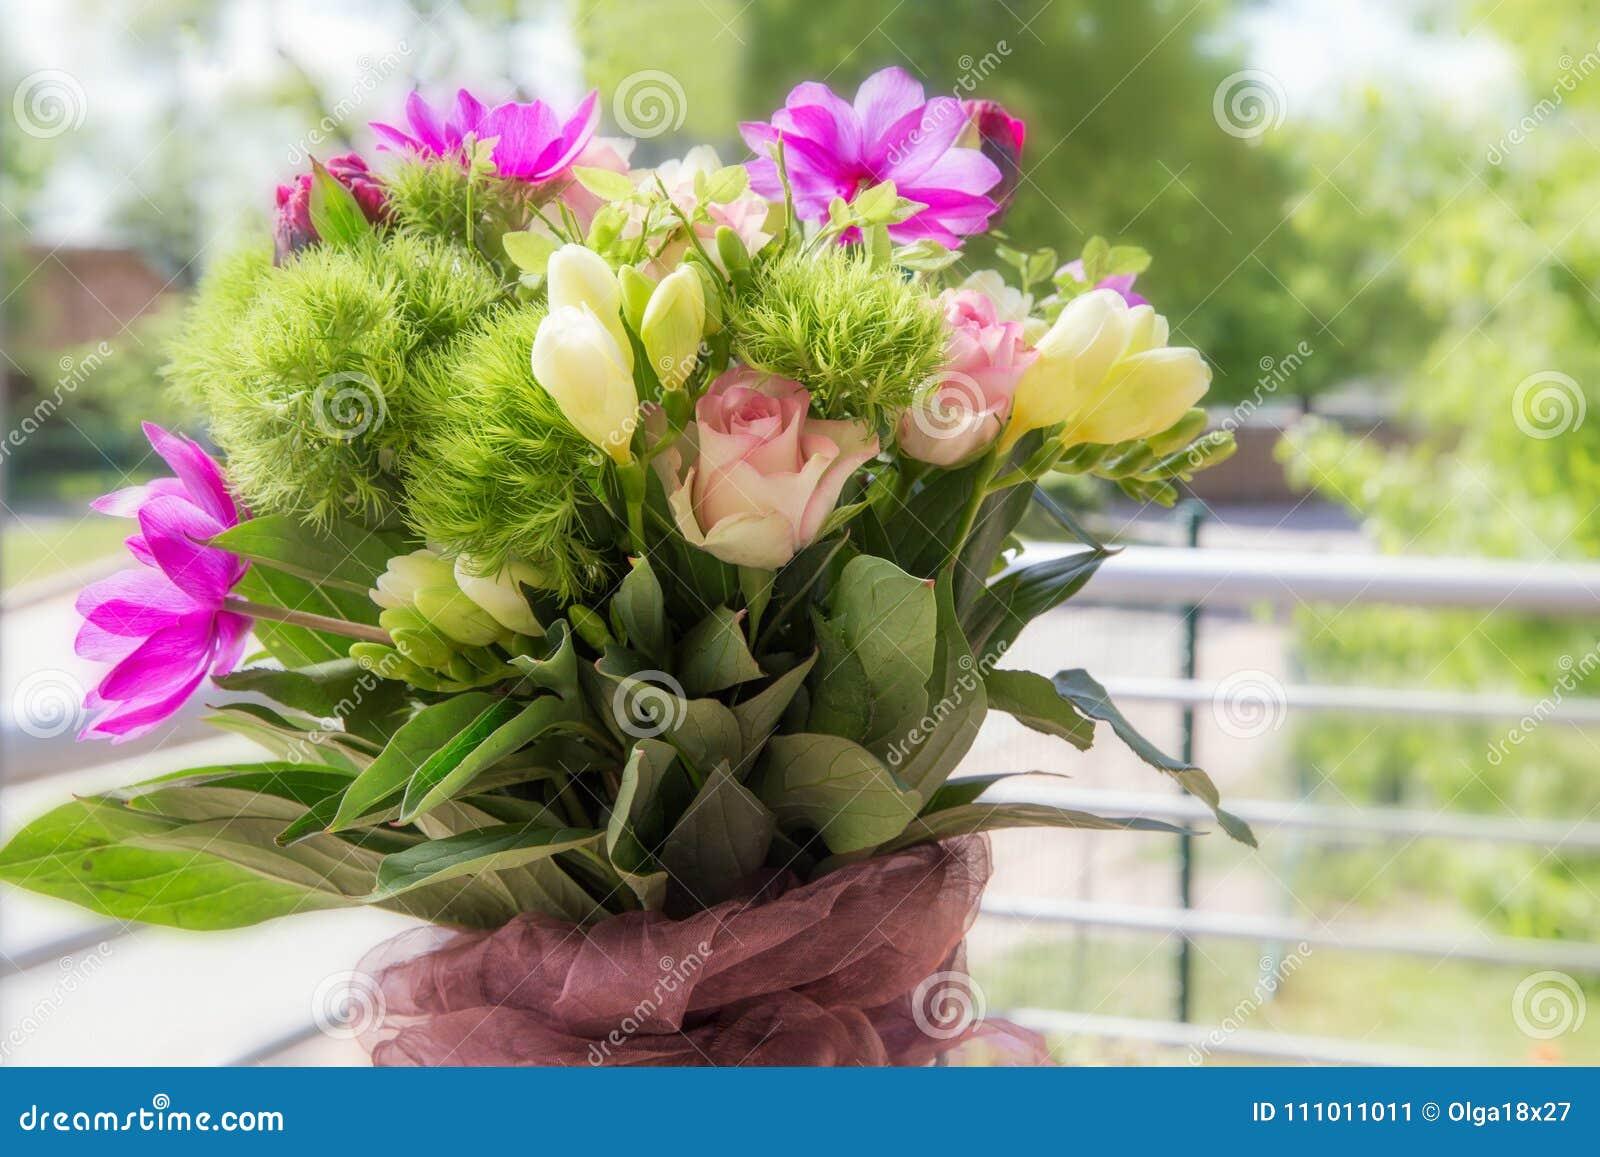 Beautiful bouquet flower in vase stock image image of love flower download beautiful bouquet flower in vase stock image image of love flower 111011011 izmirmasajfo